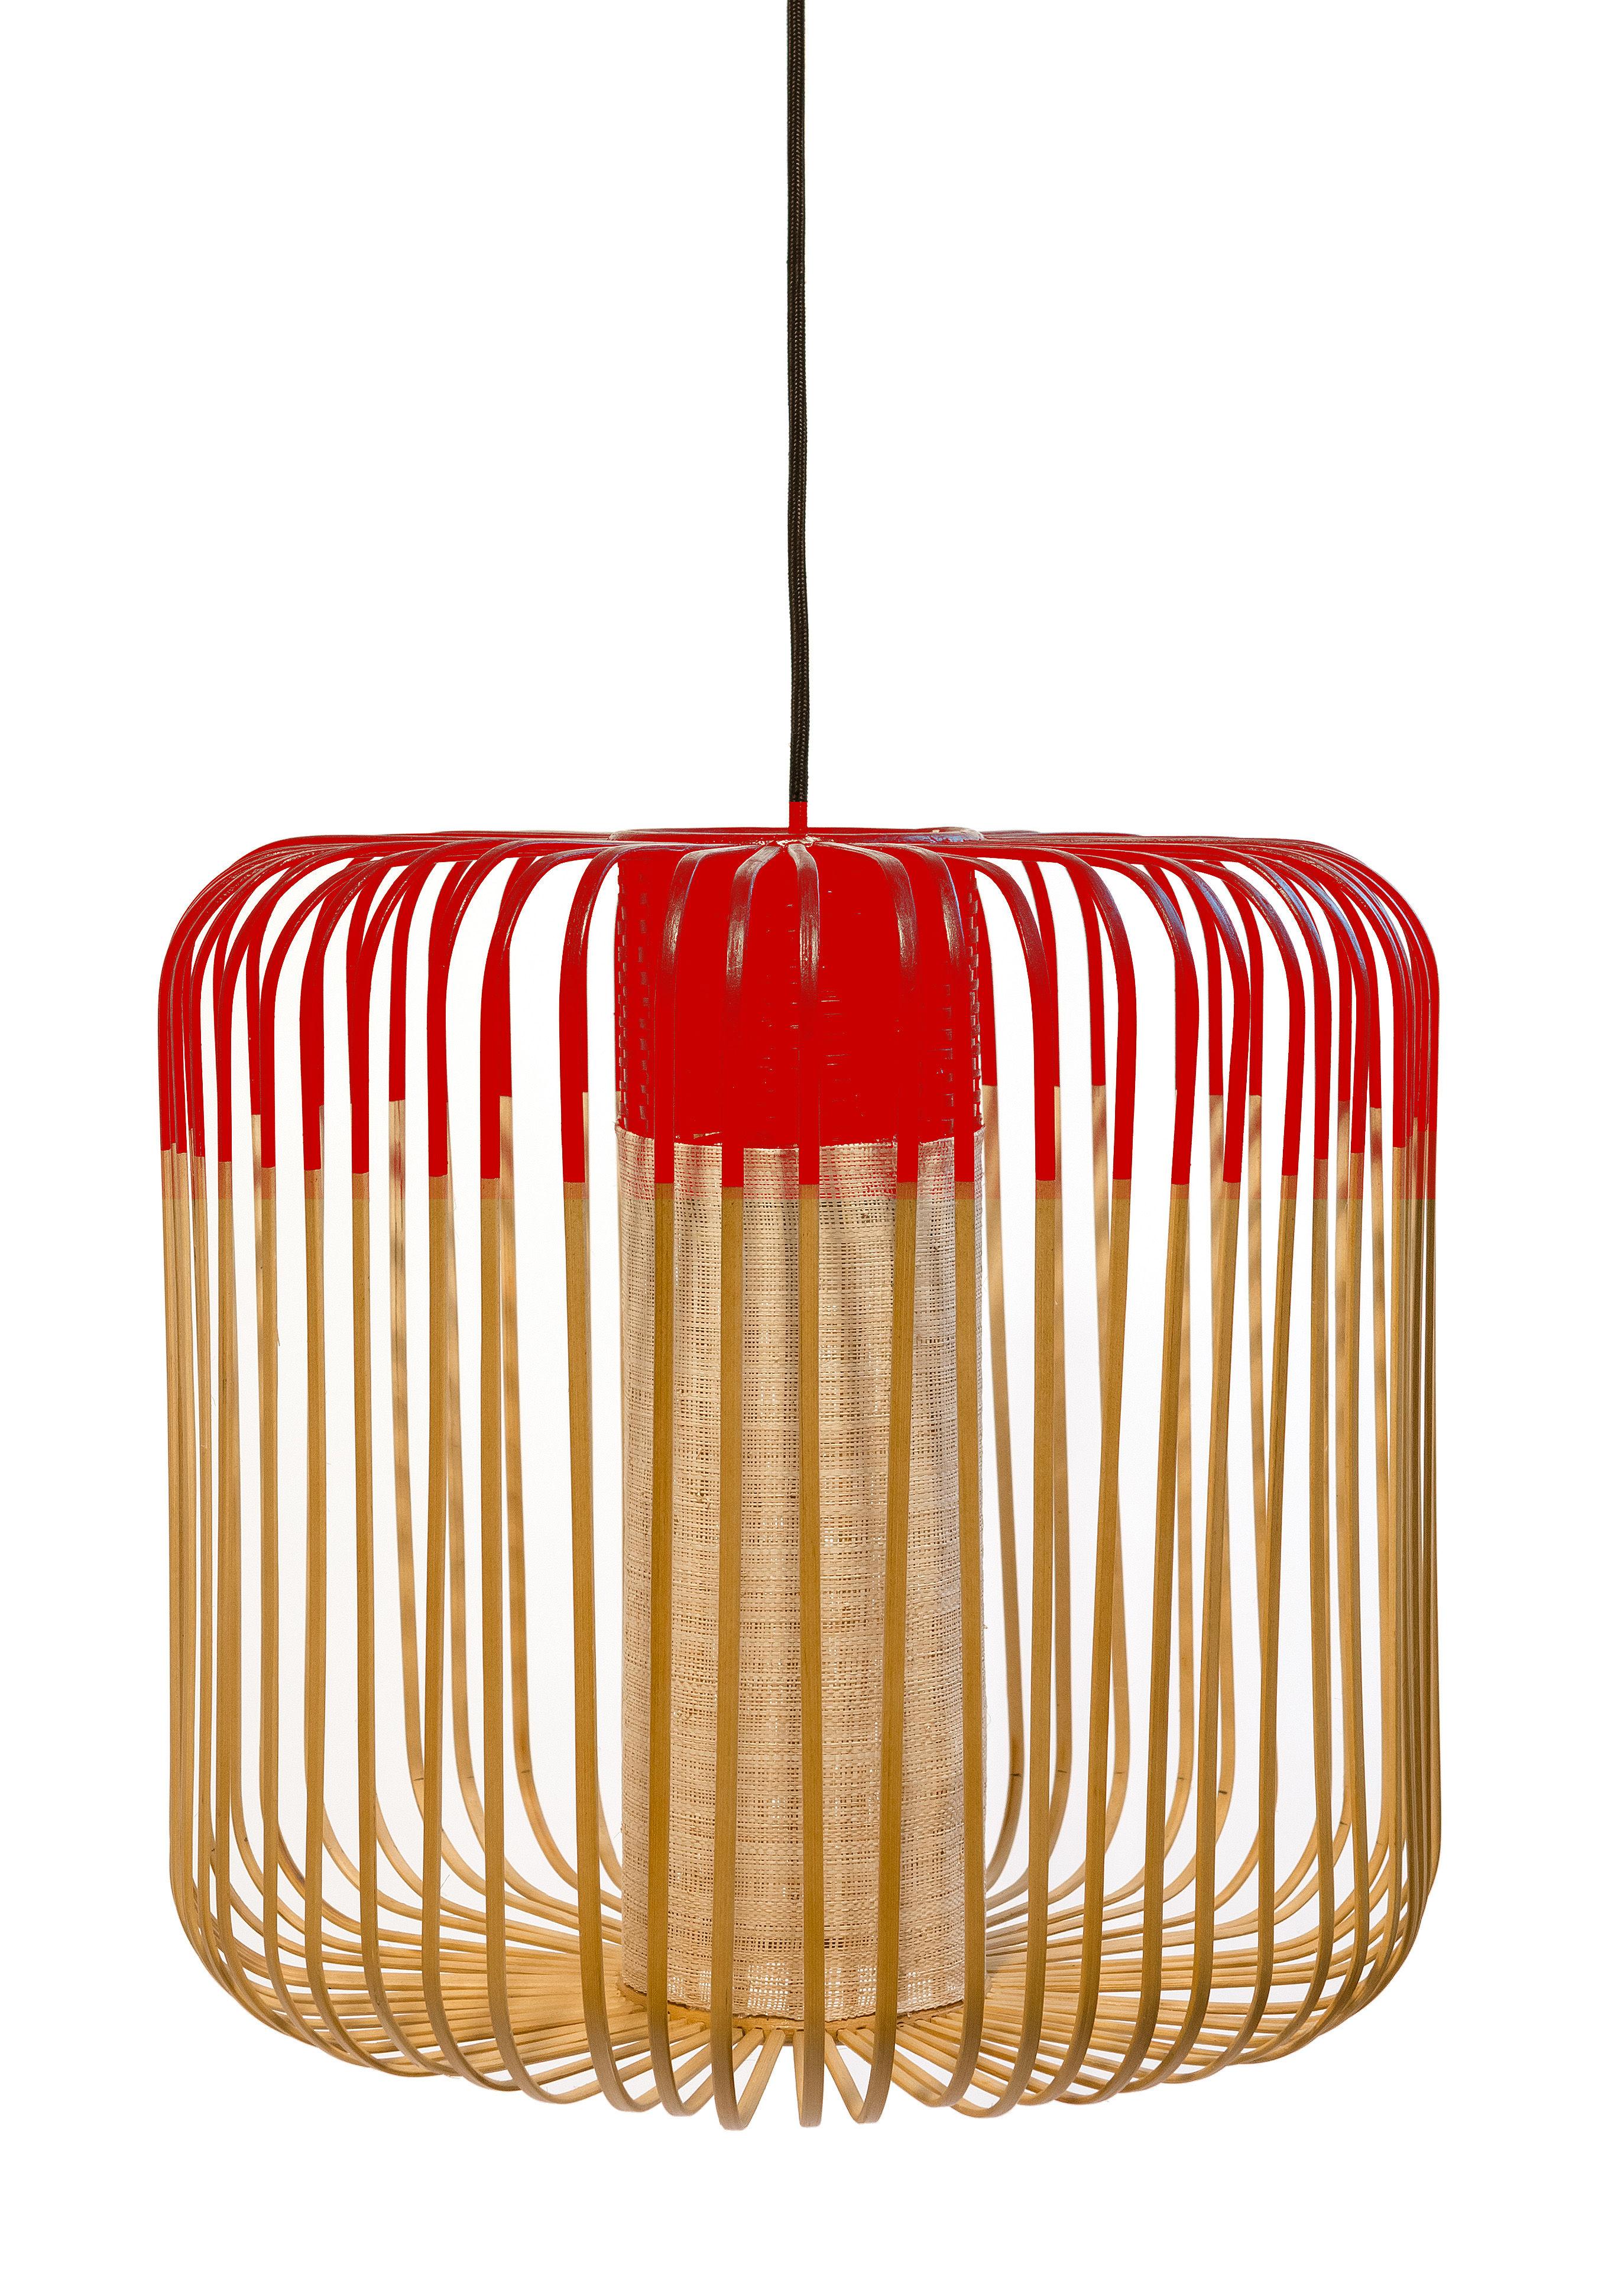 Leuchten - Pendelleuchten - Bamboo Light M Outdoor Pendelleuchte / H 40 cm x Ø 45 cm - Forestier - Rot / natur - Kautschuk, Naturbambus